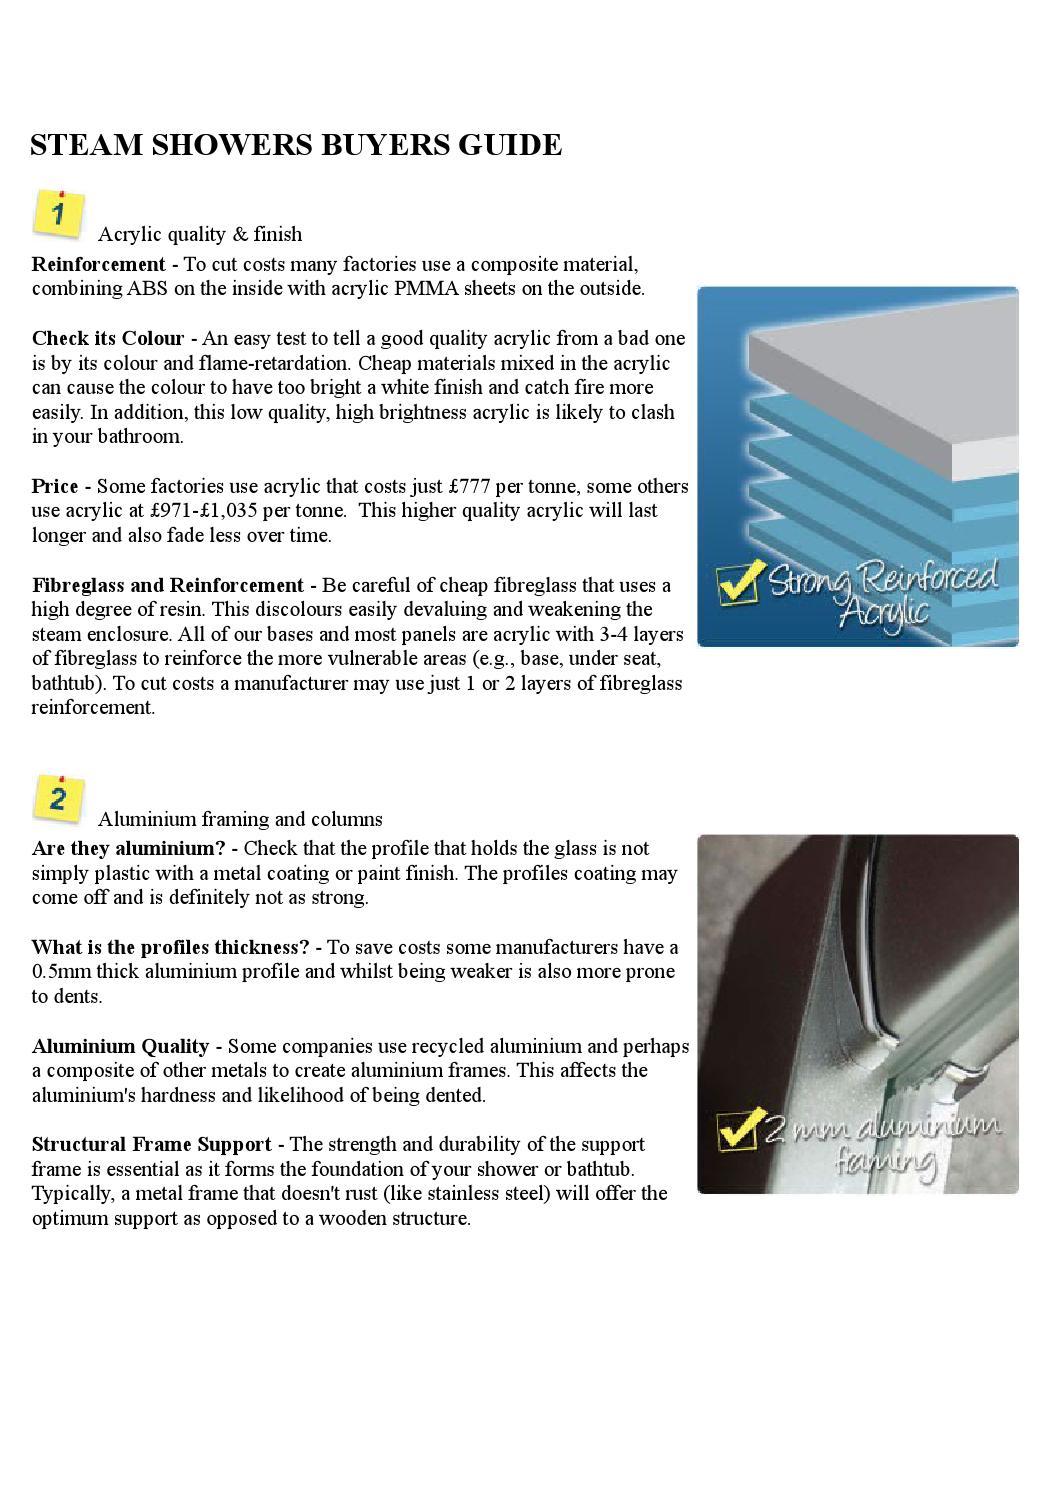 Steam shower buying guide by steam shower - issuu